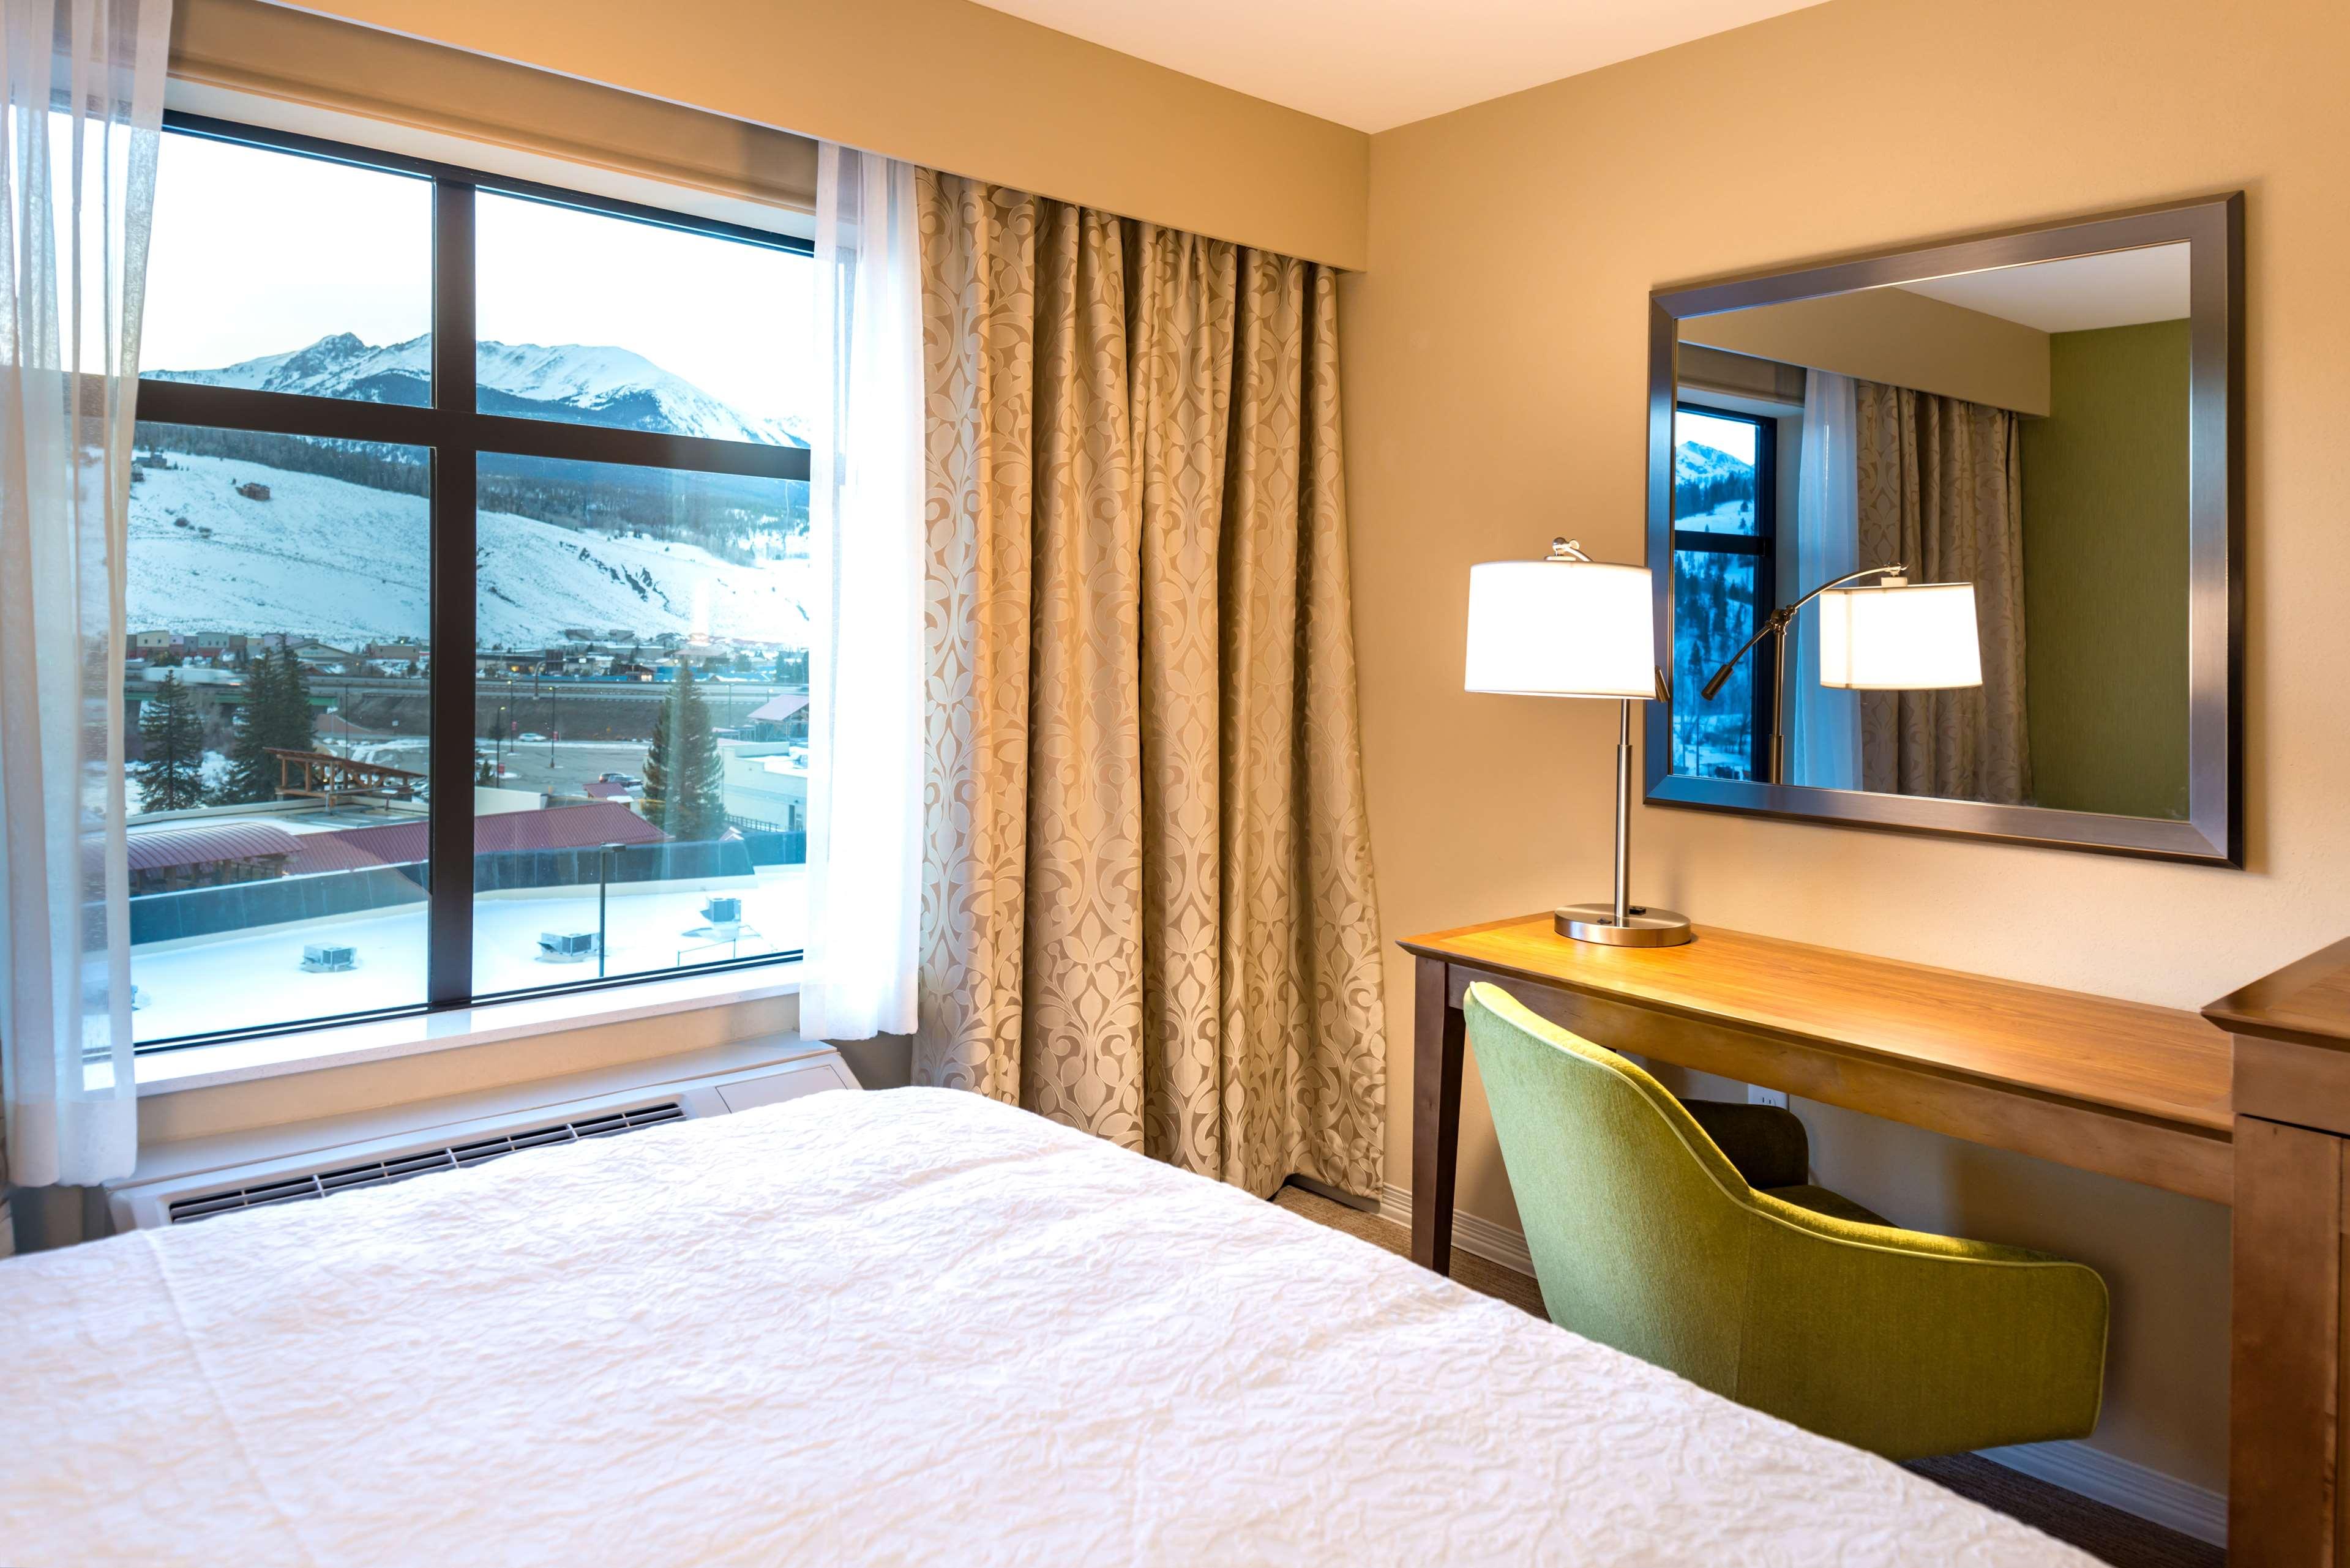 Hampton Inn & Suites Silverthorne image 21